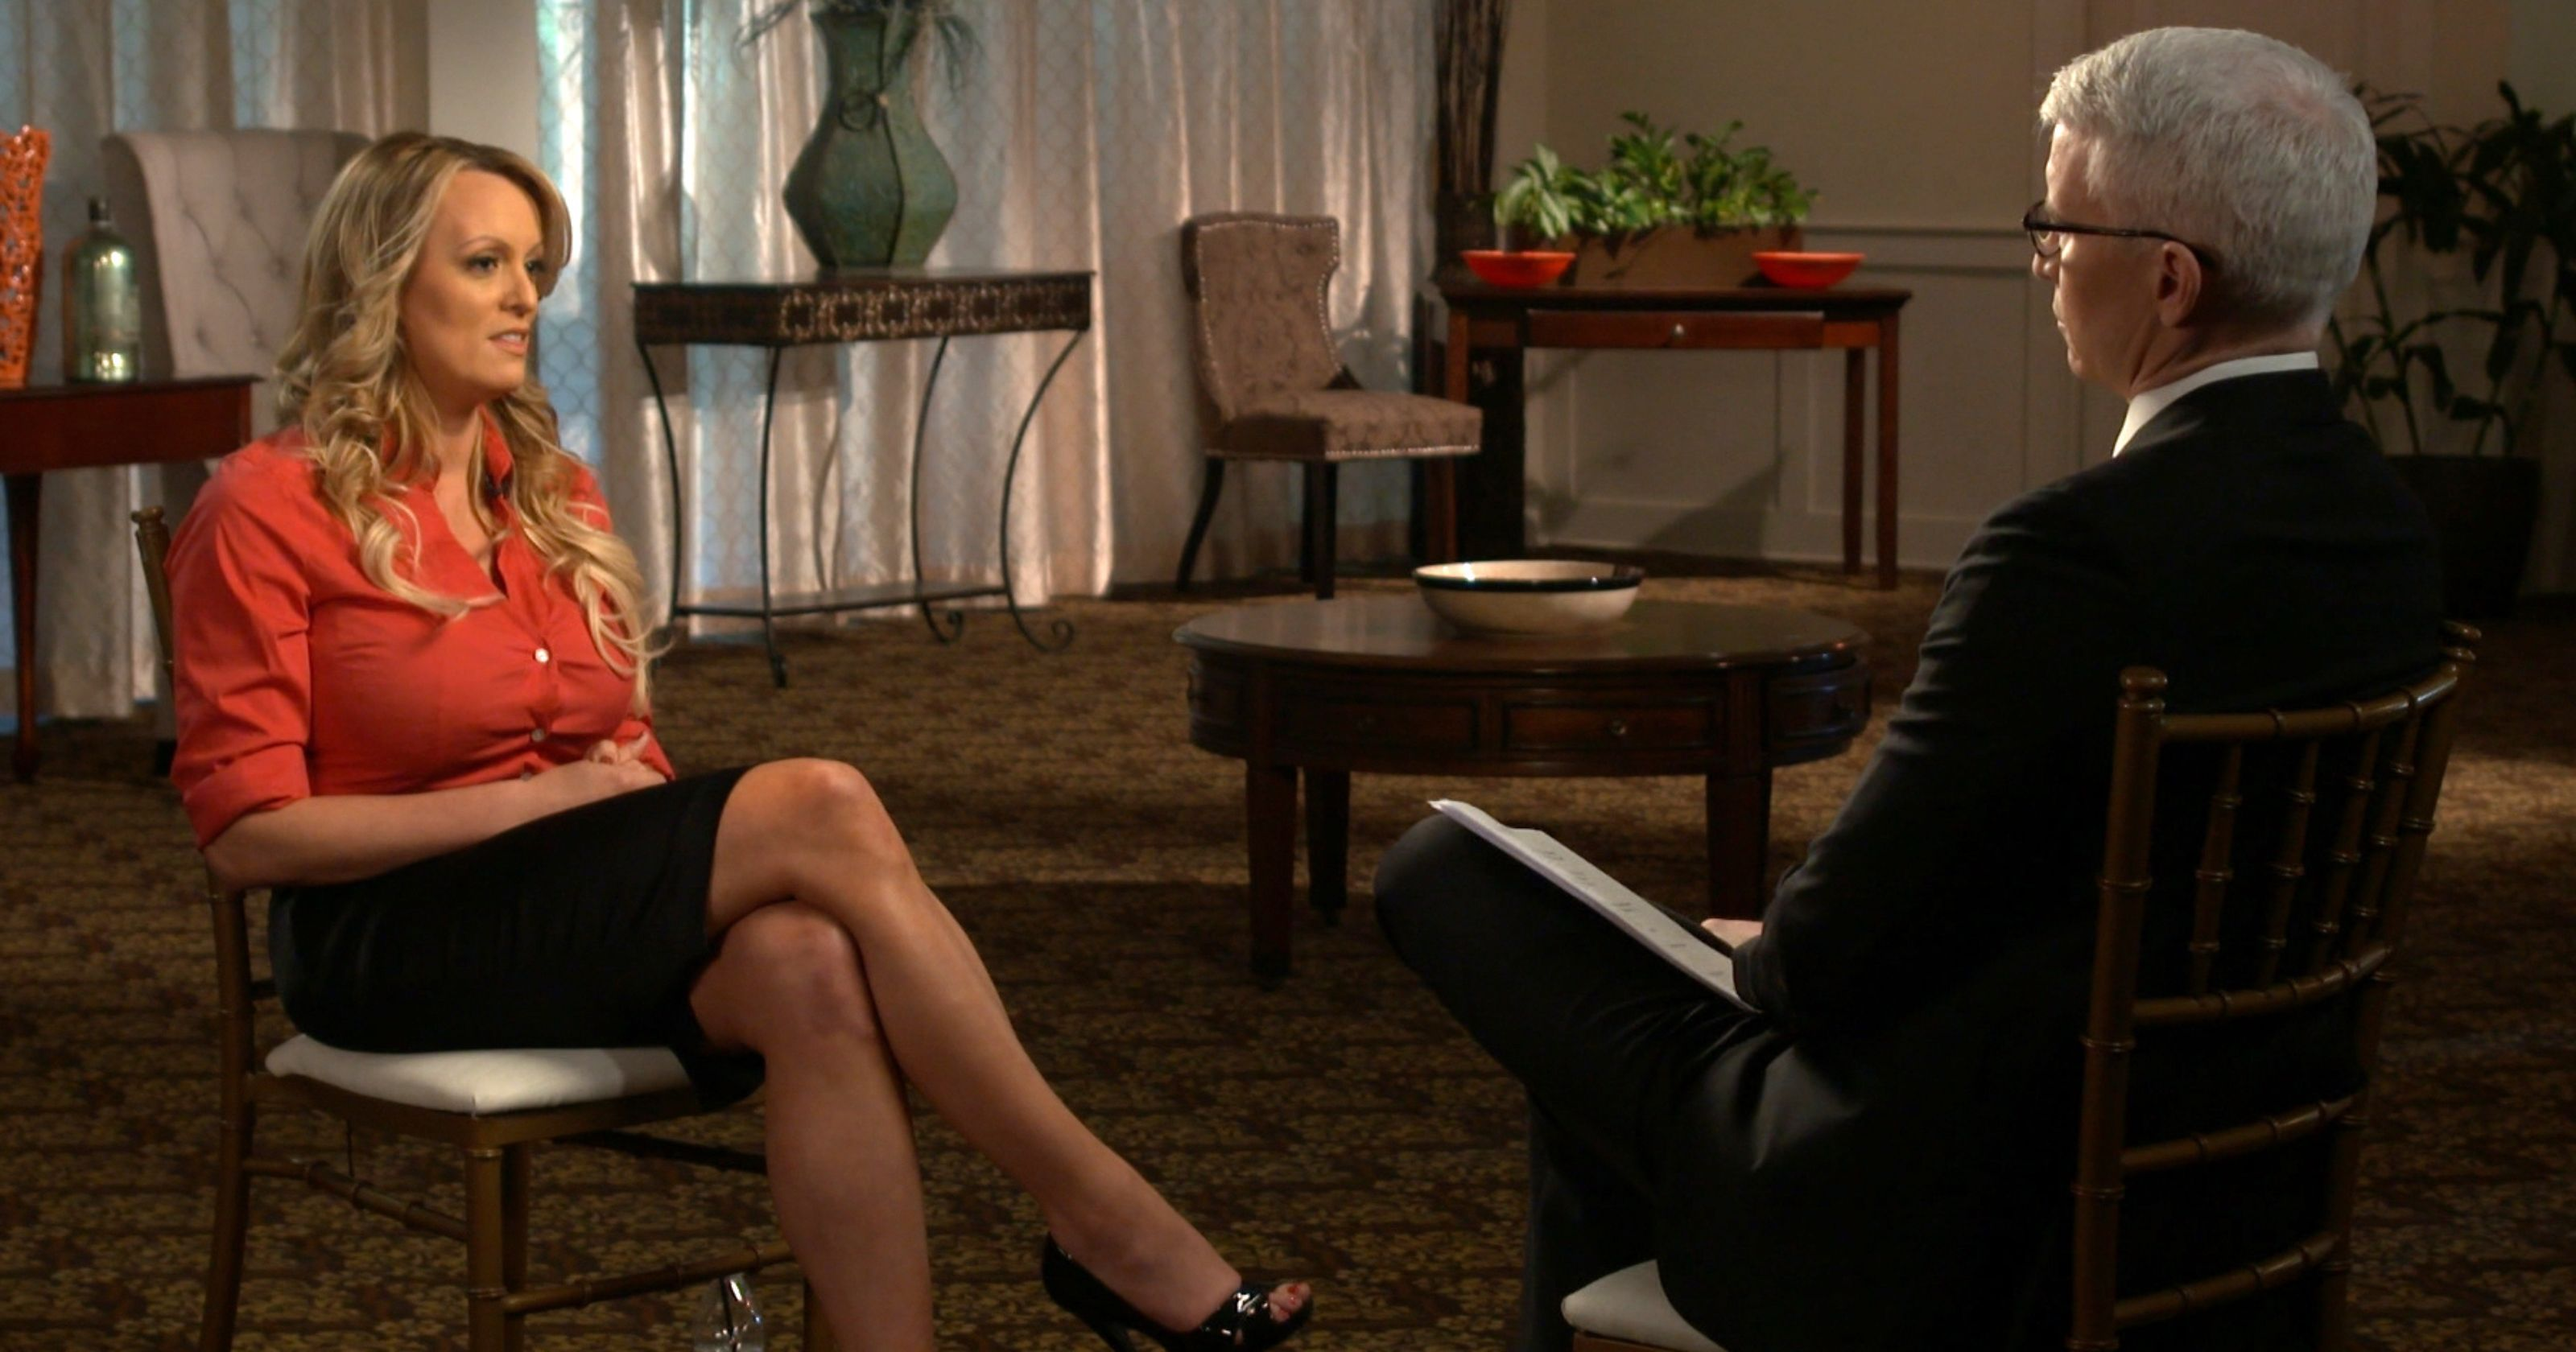 60 Minutes, entrevista con Stormy Daniels